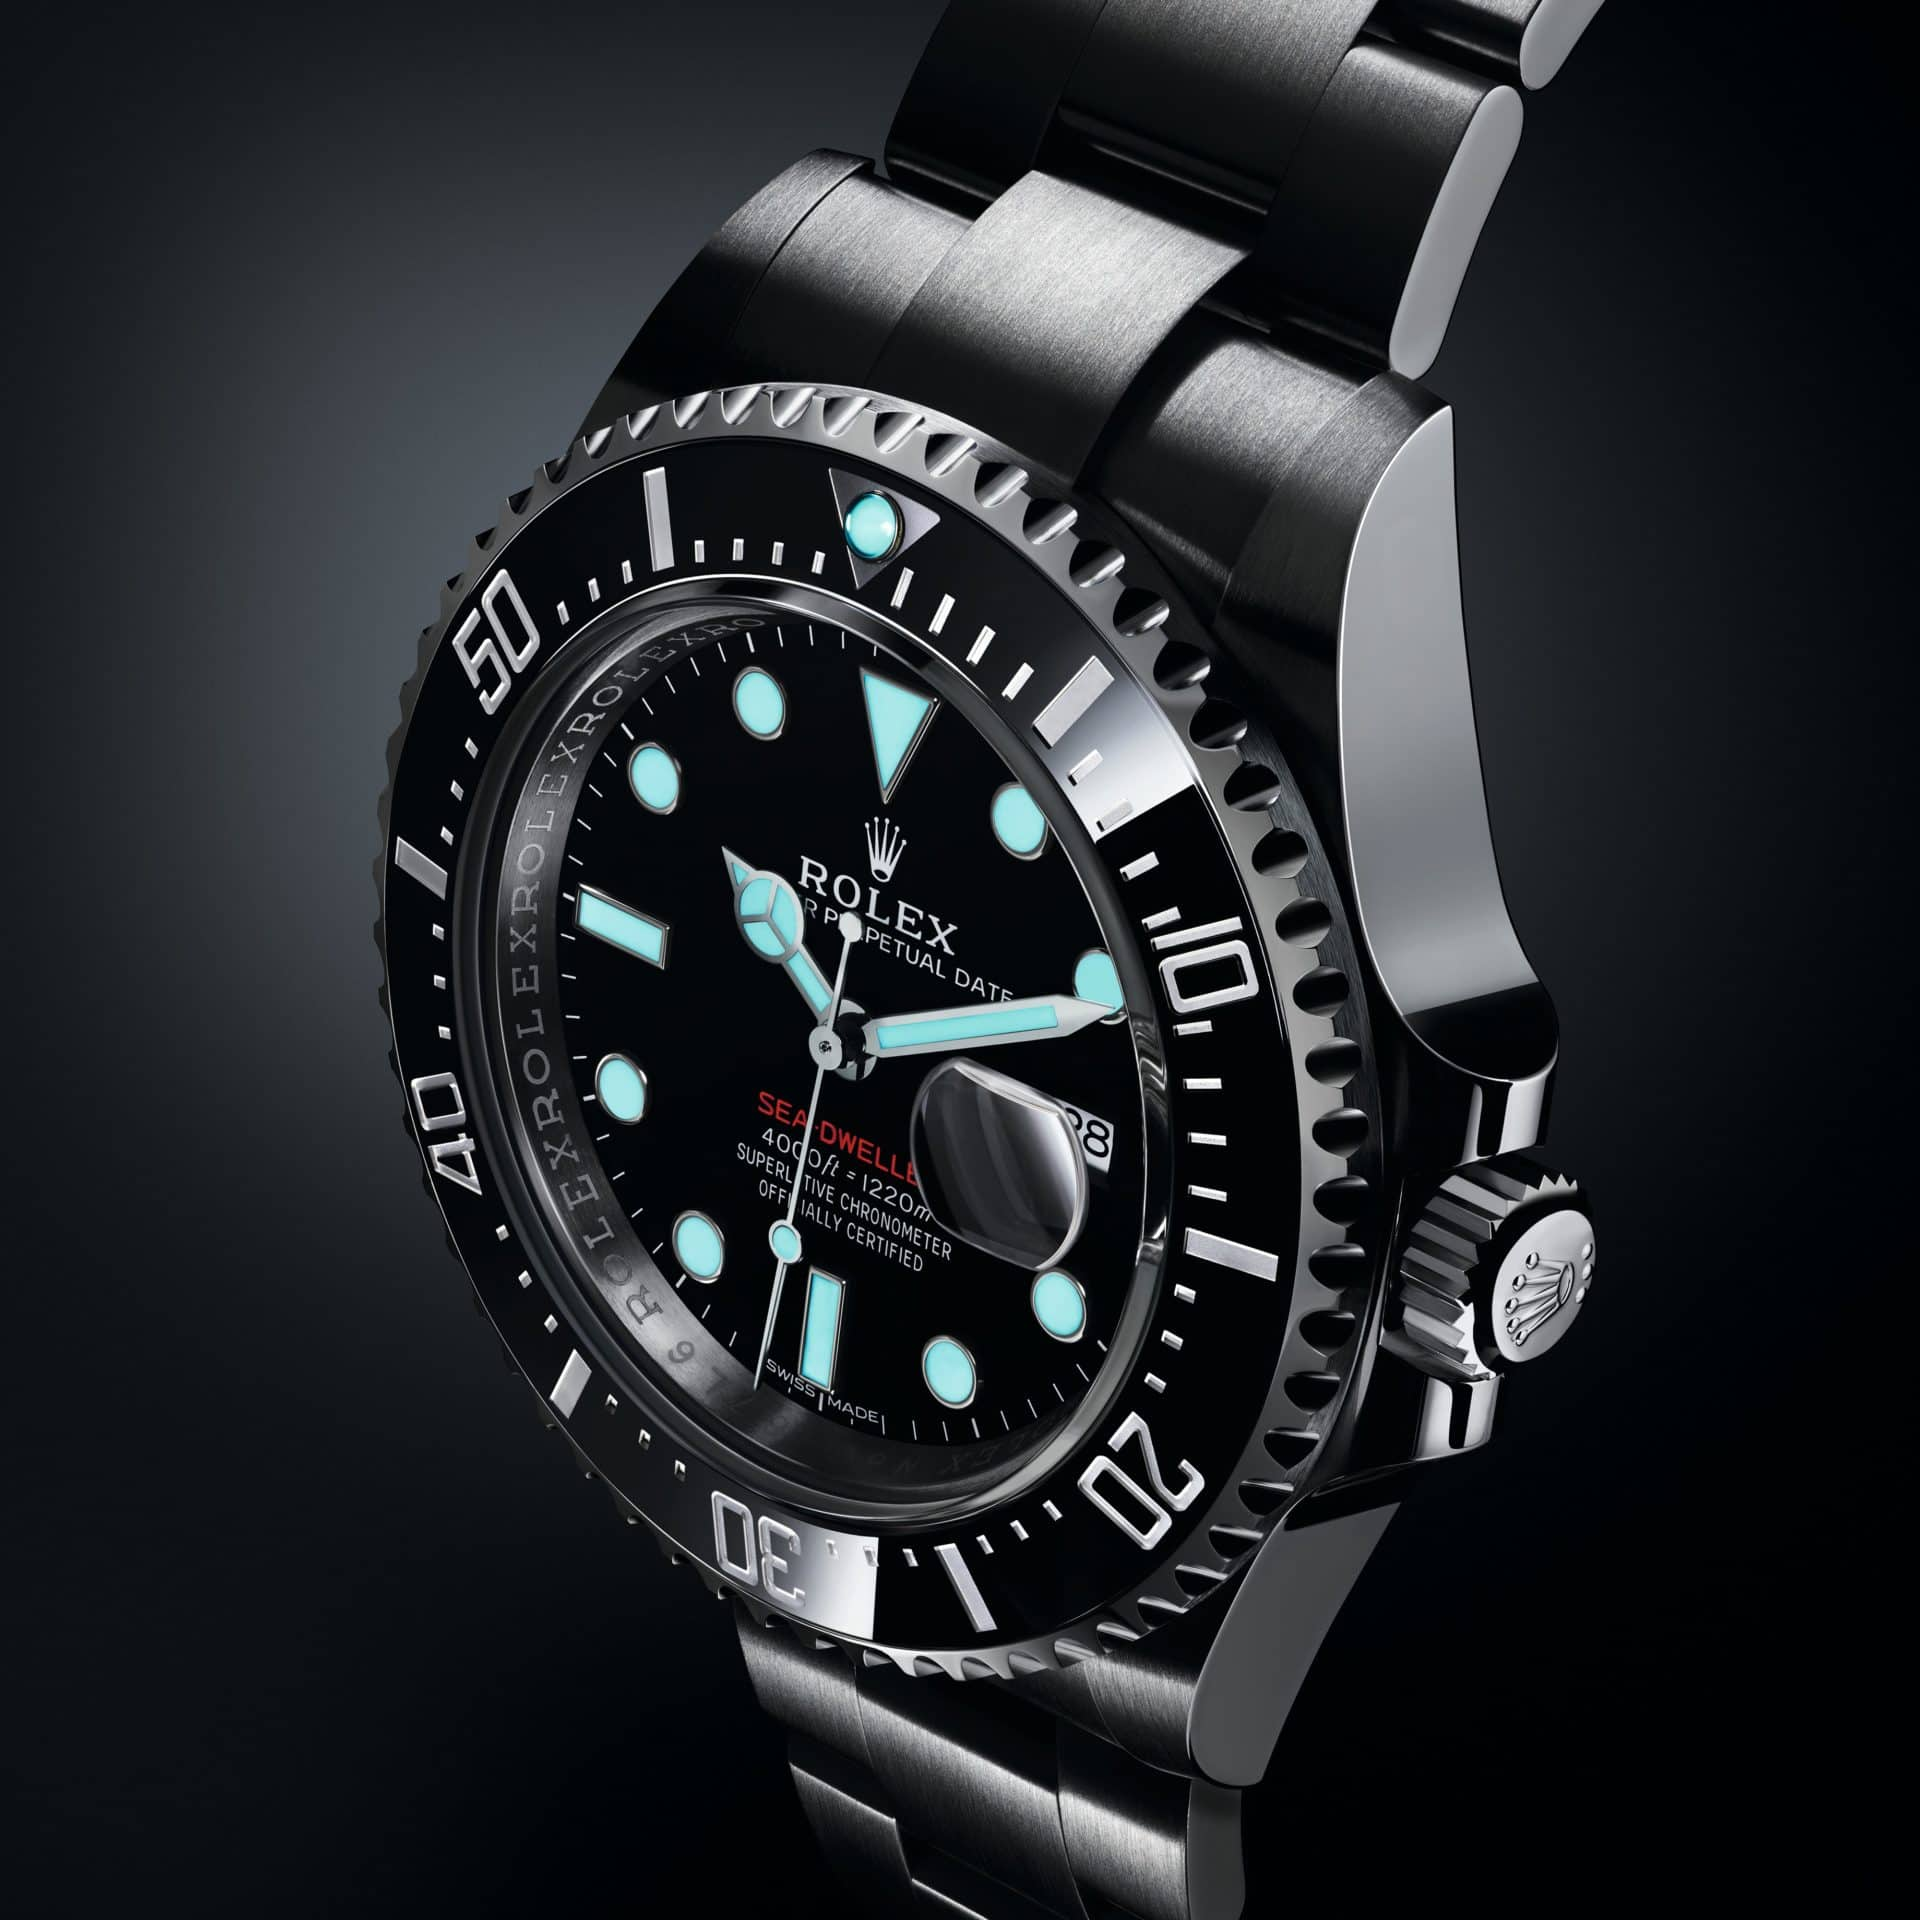 Sea Dweller 126600 005